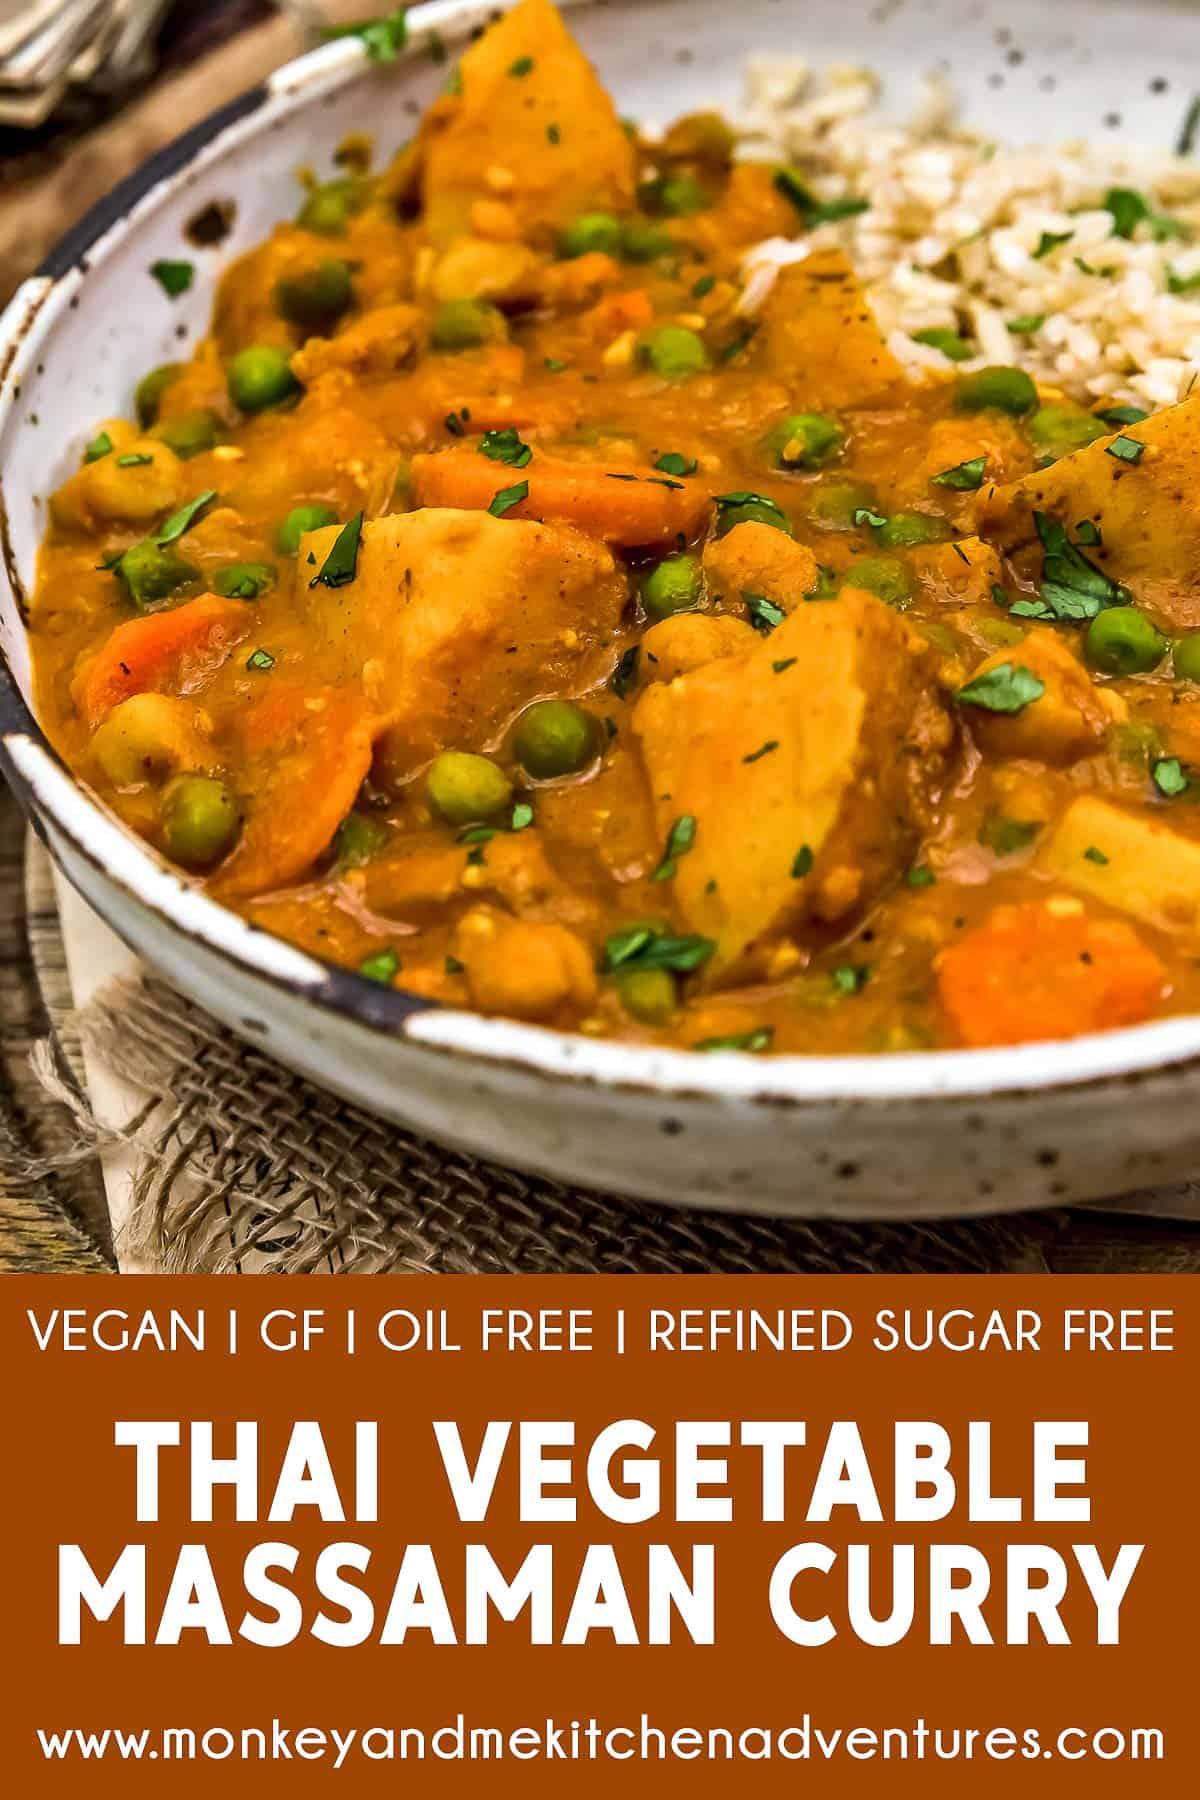 Thai Vegetable Massaman Curry with text description